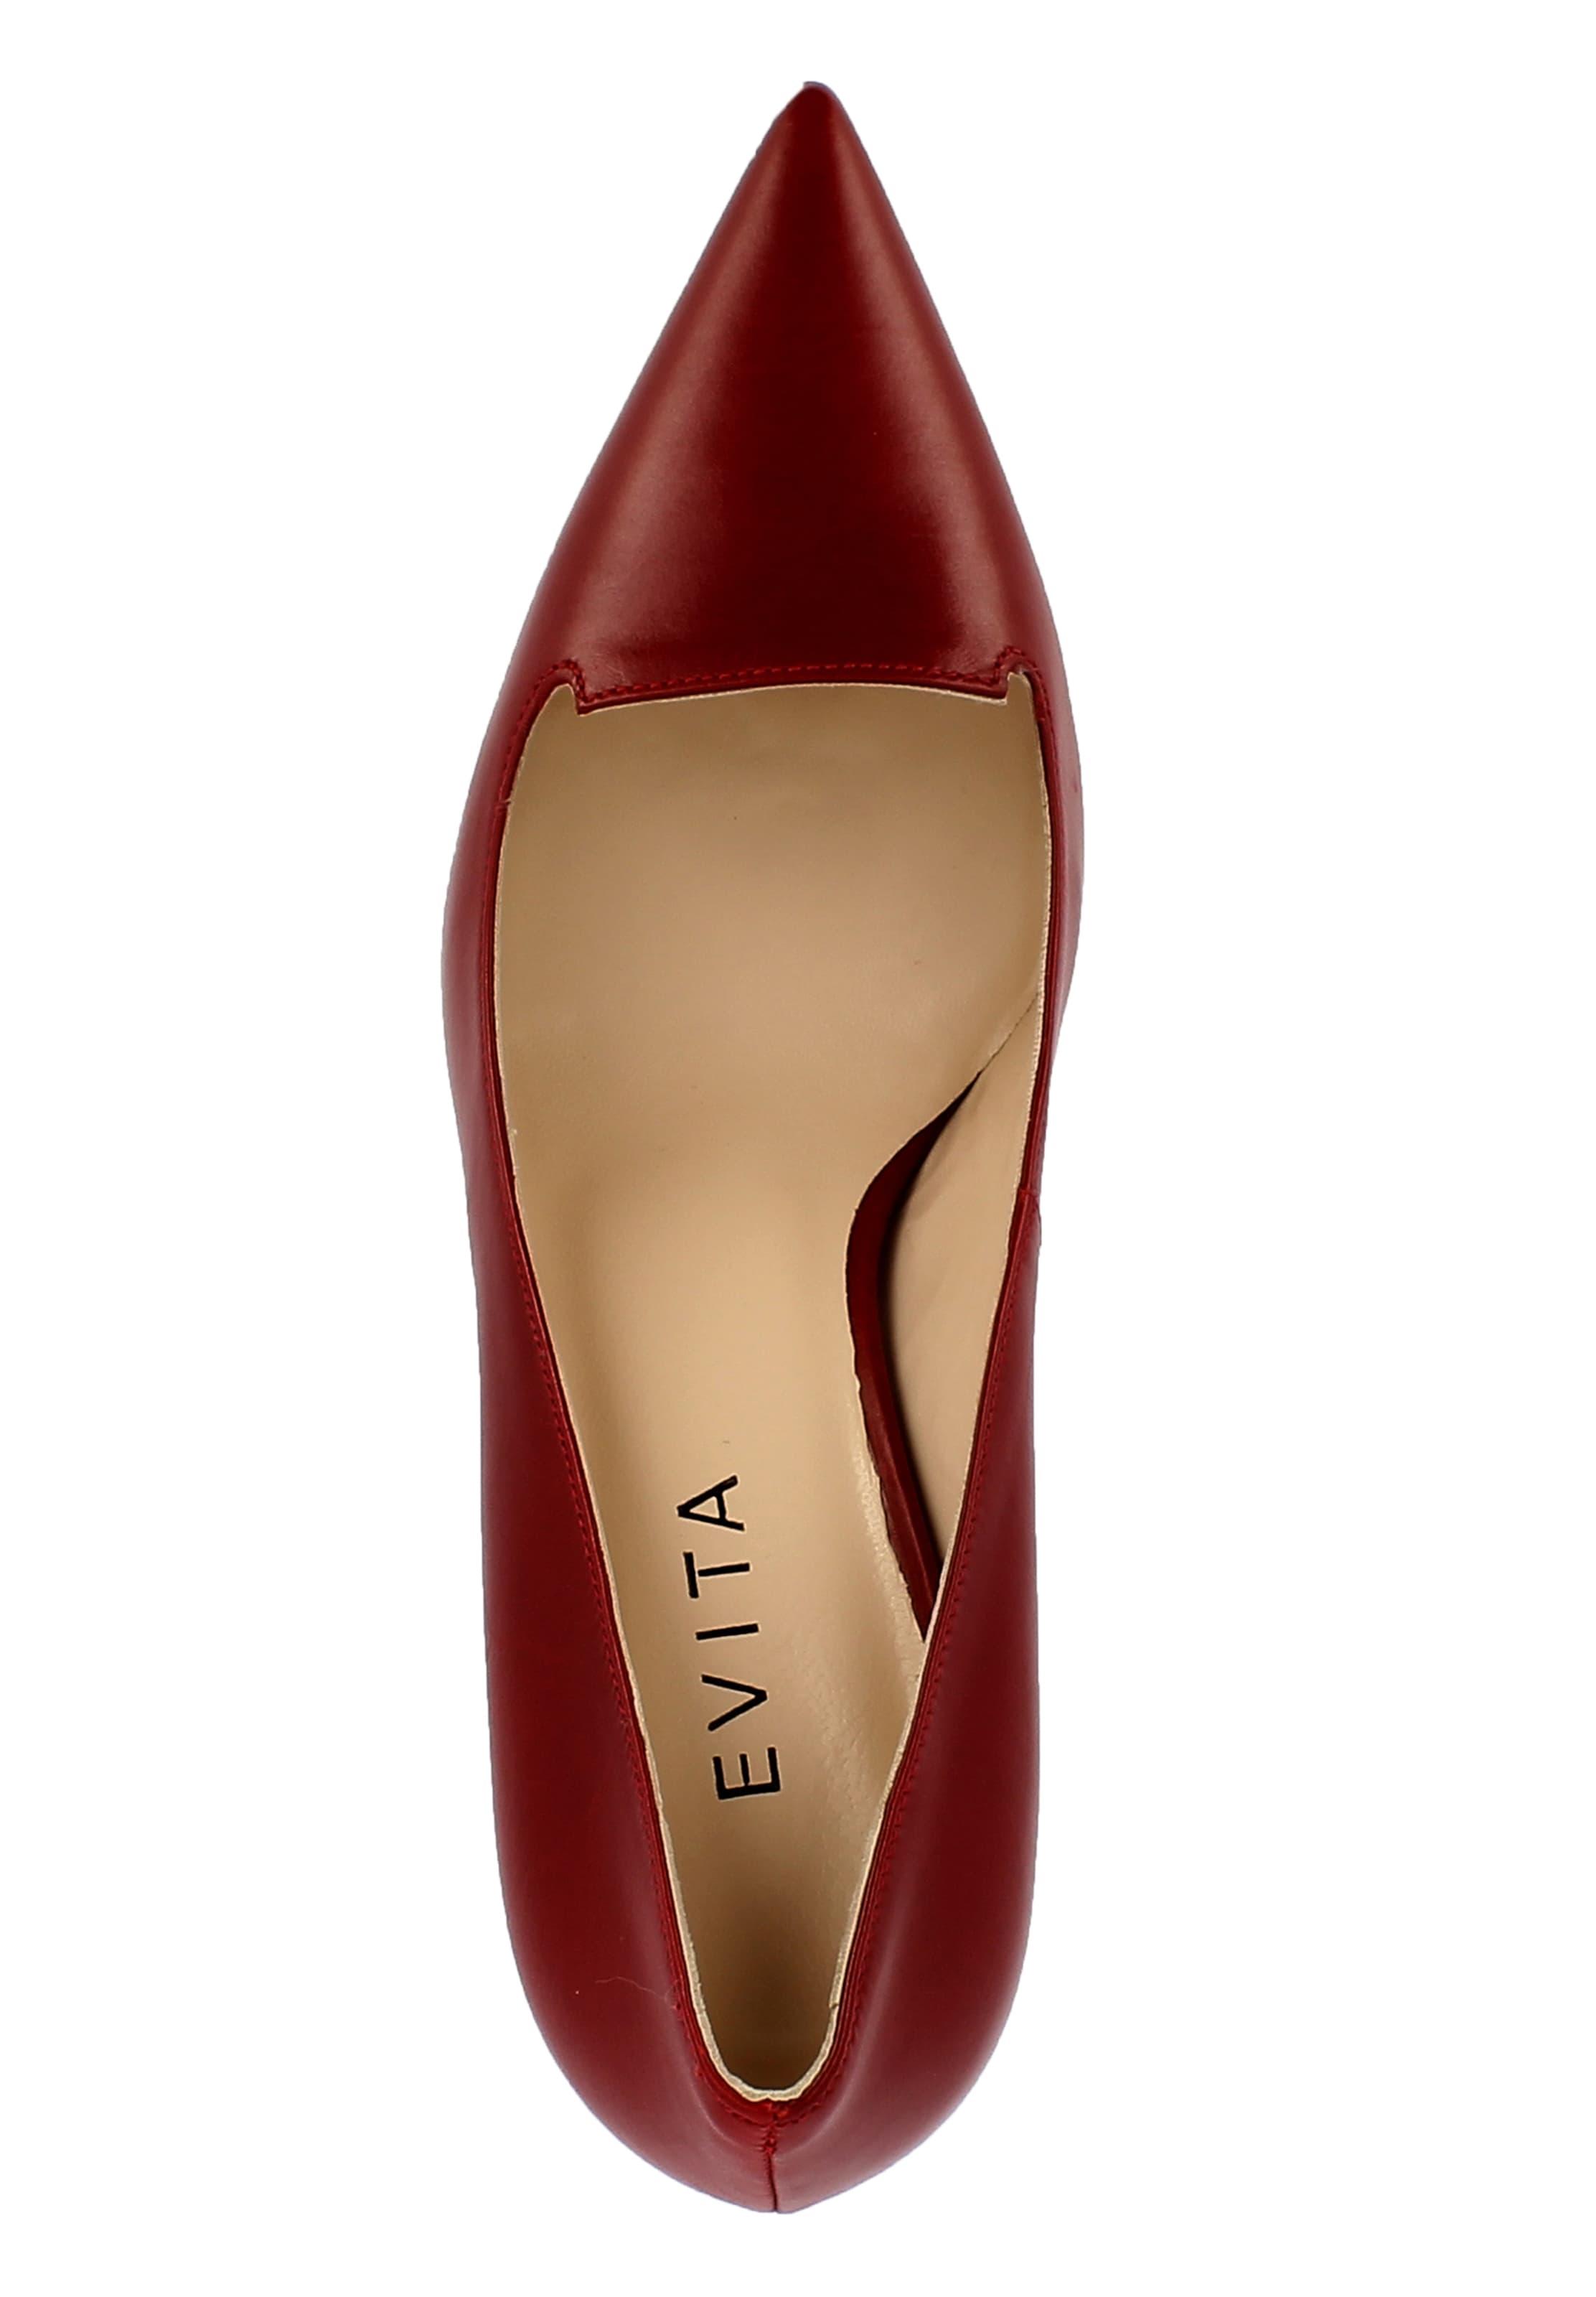 Escarpins Rouge Evita Escarpins Evita Evita Rouge En En Escarpins En shQrdCxtB